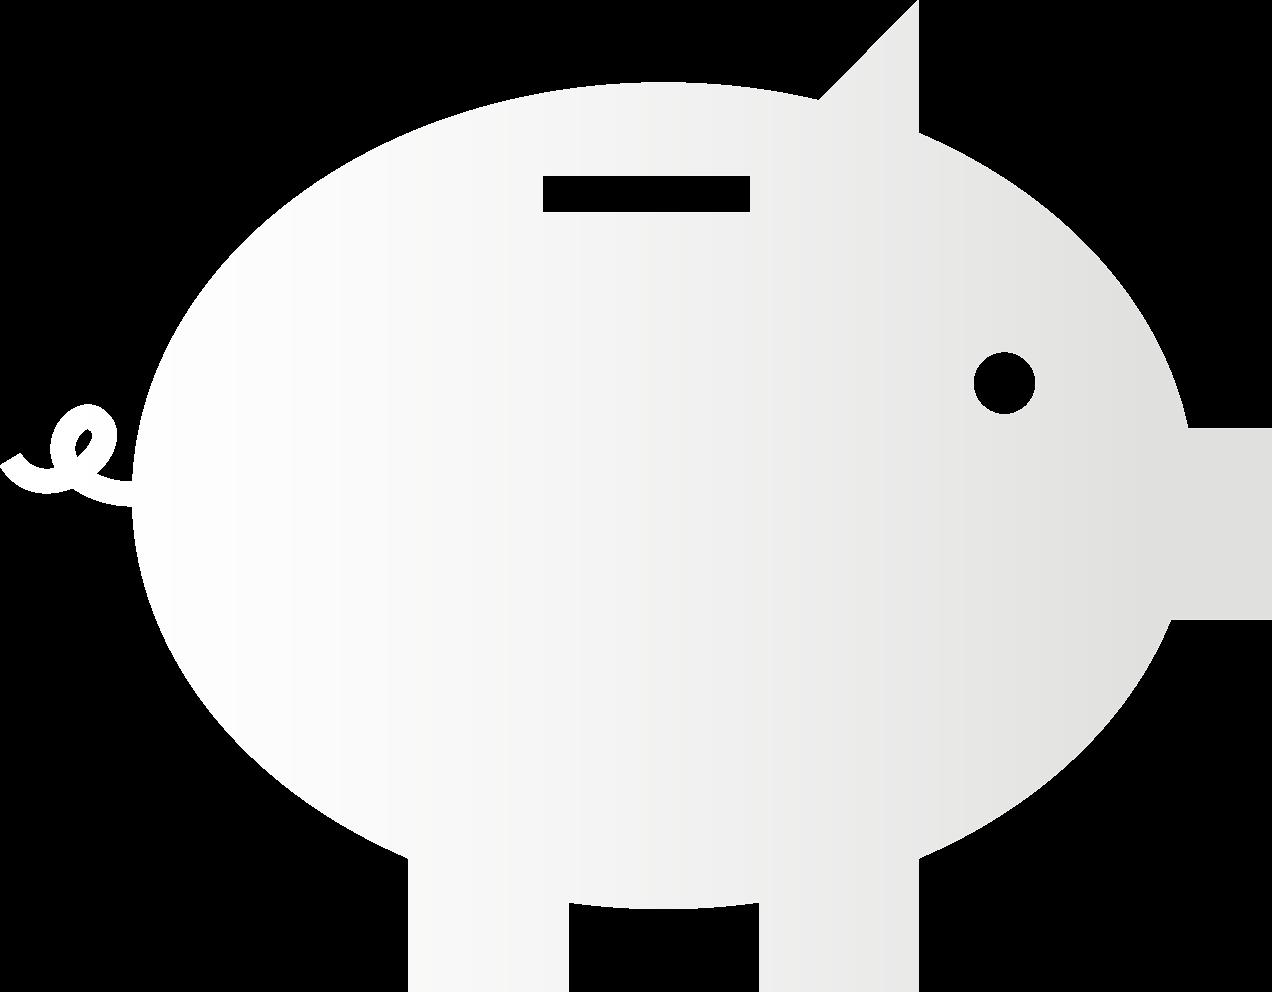 paper piggy bank icon